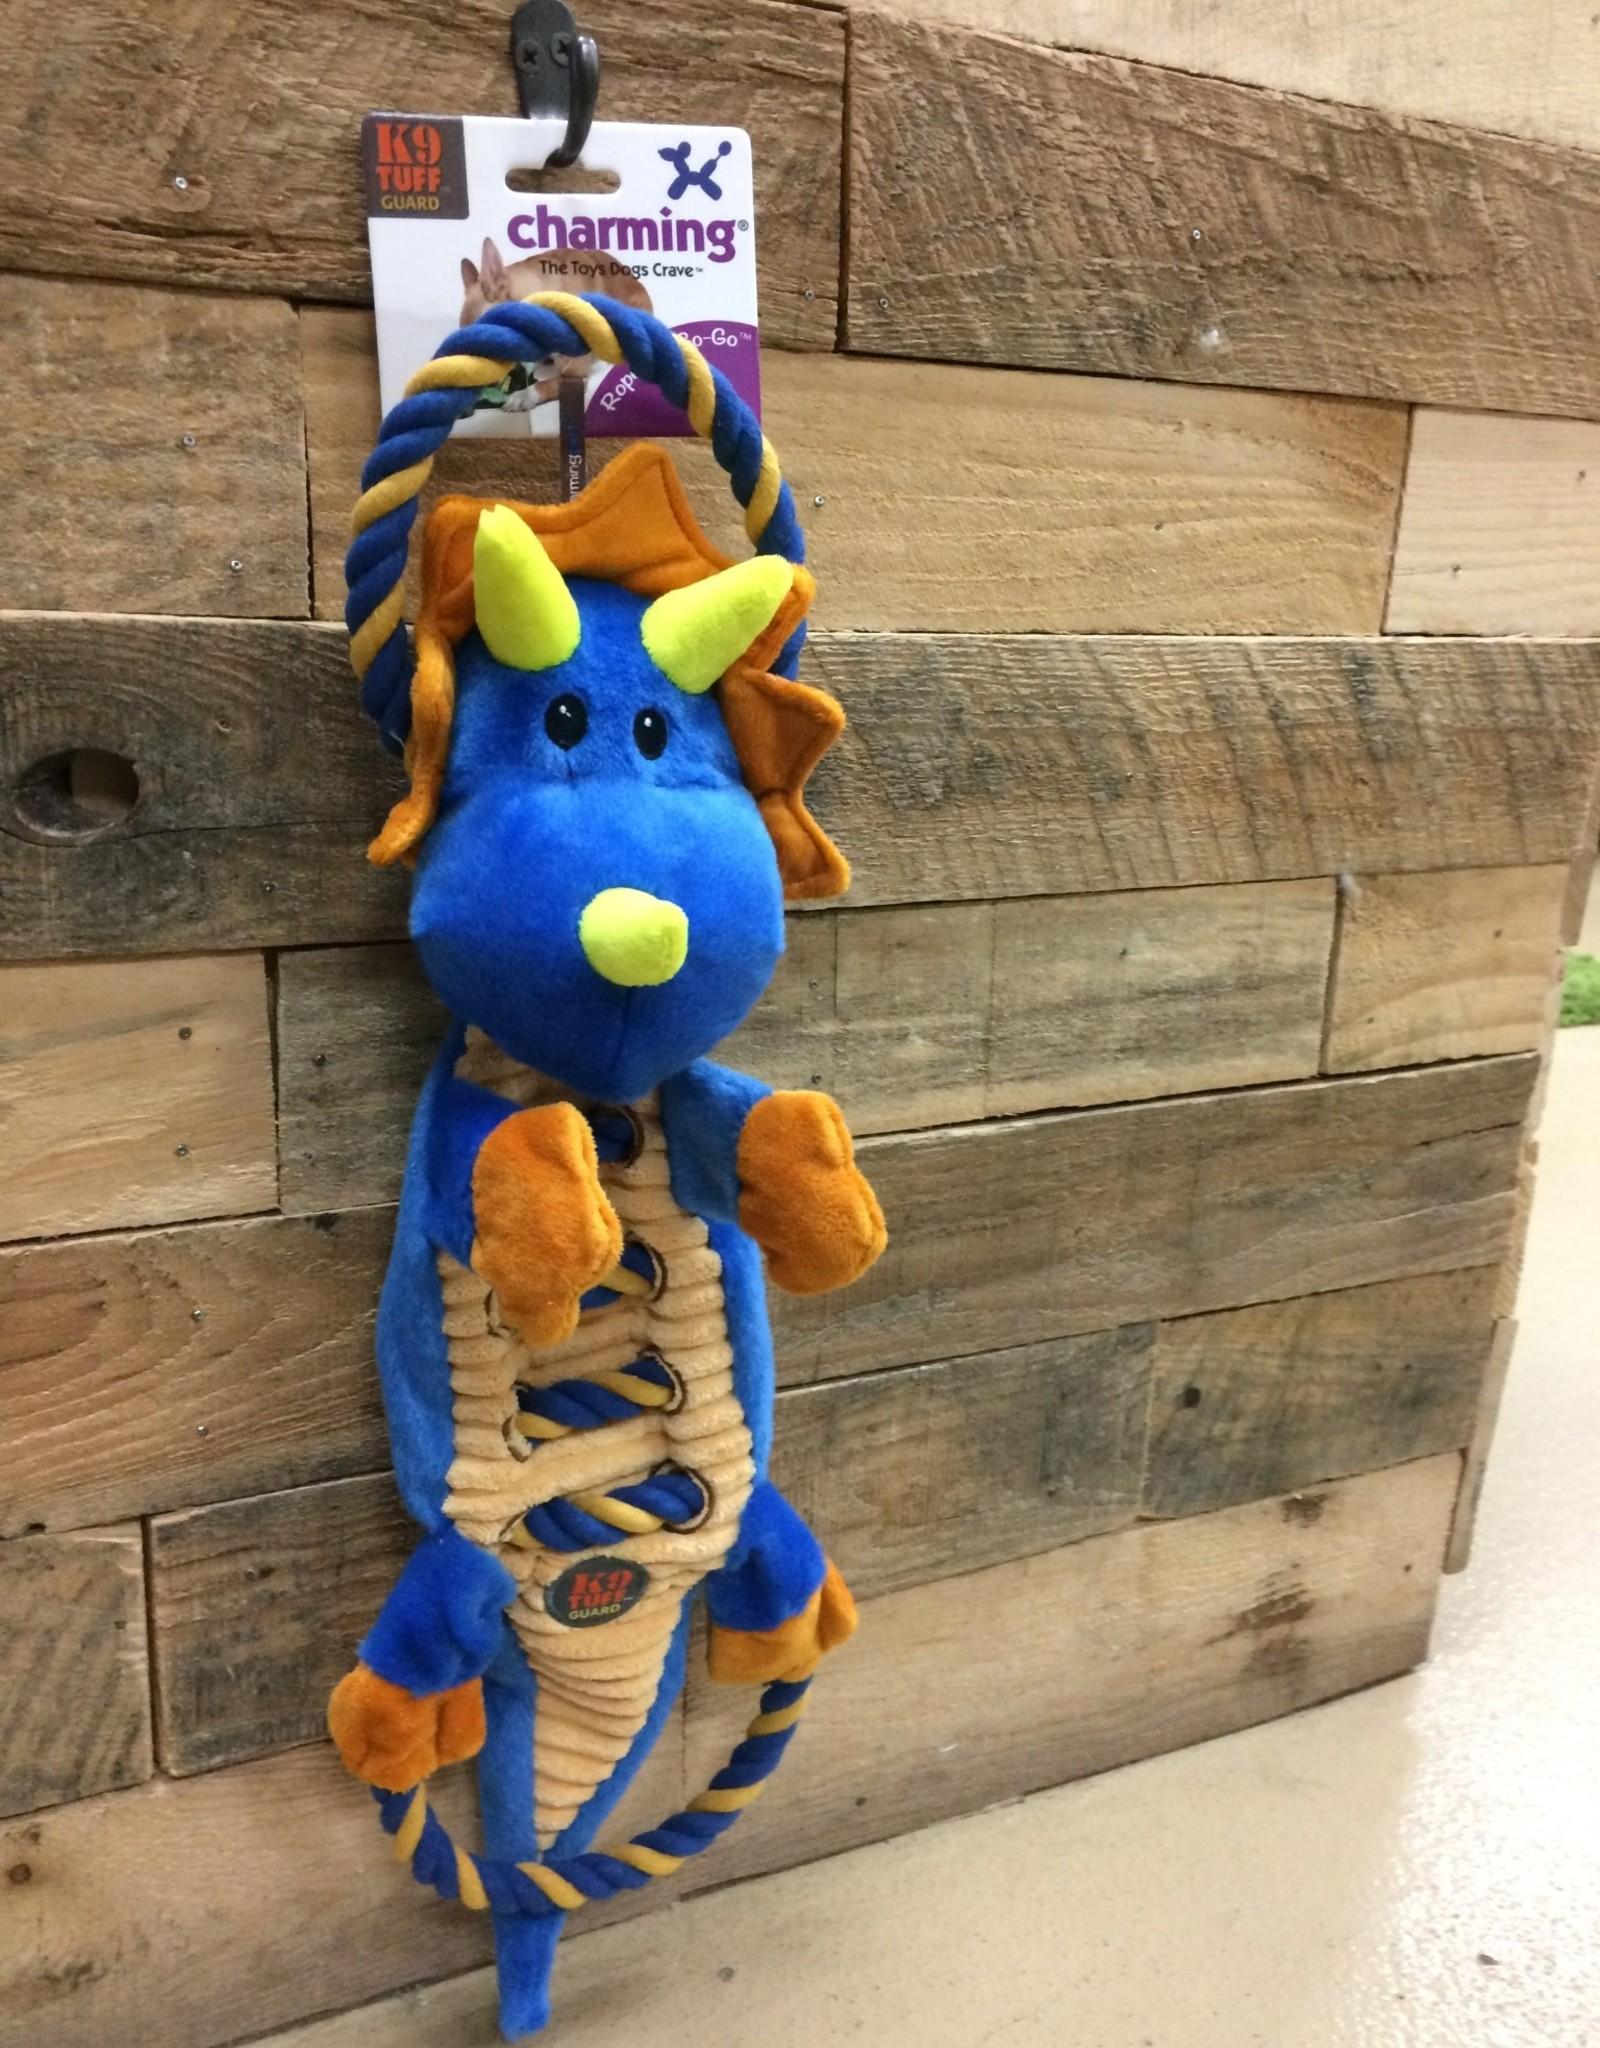 Outward Hound - Charming Pet Charming Pet ROPES-A-GO-GO DRAGON